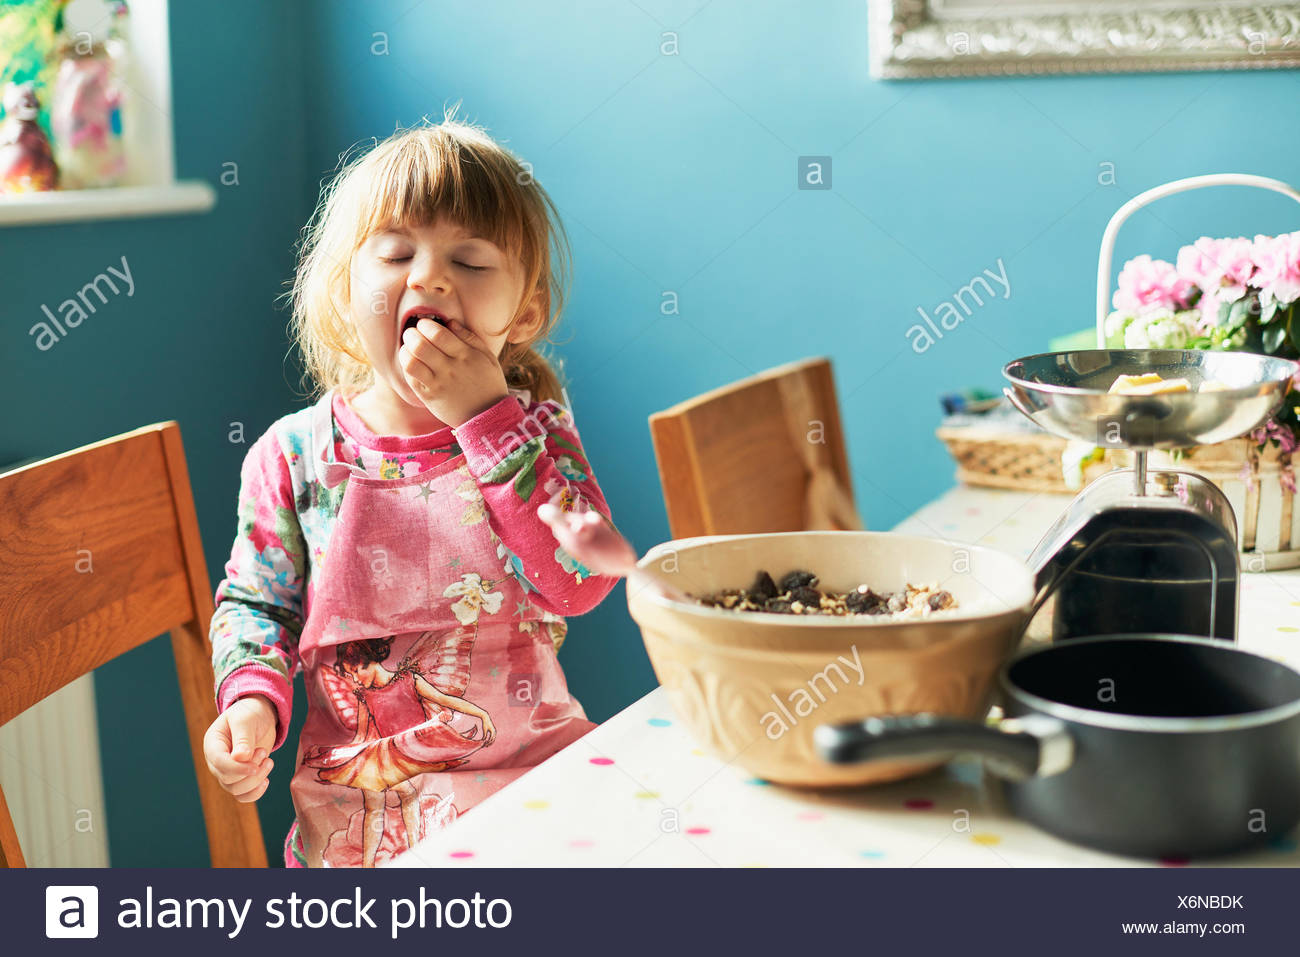 Girl tasting baking ingredients in kitchen - Stock Image